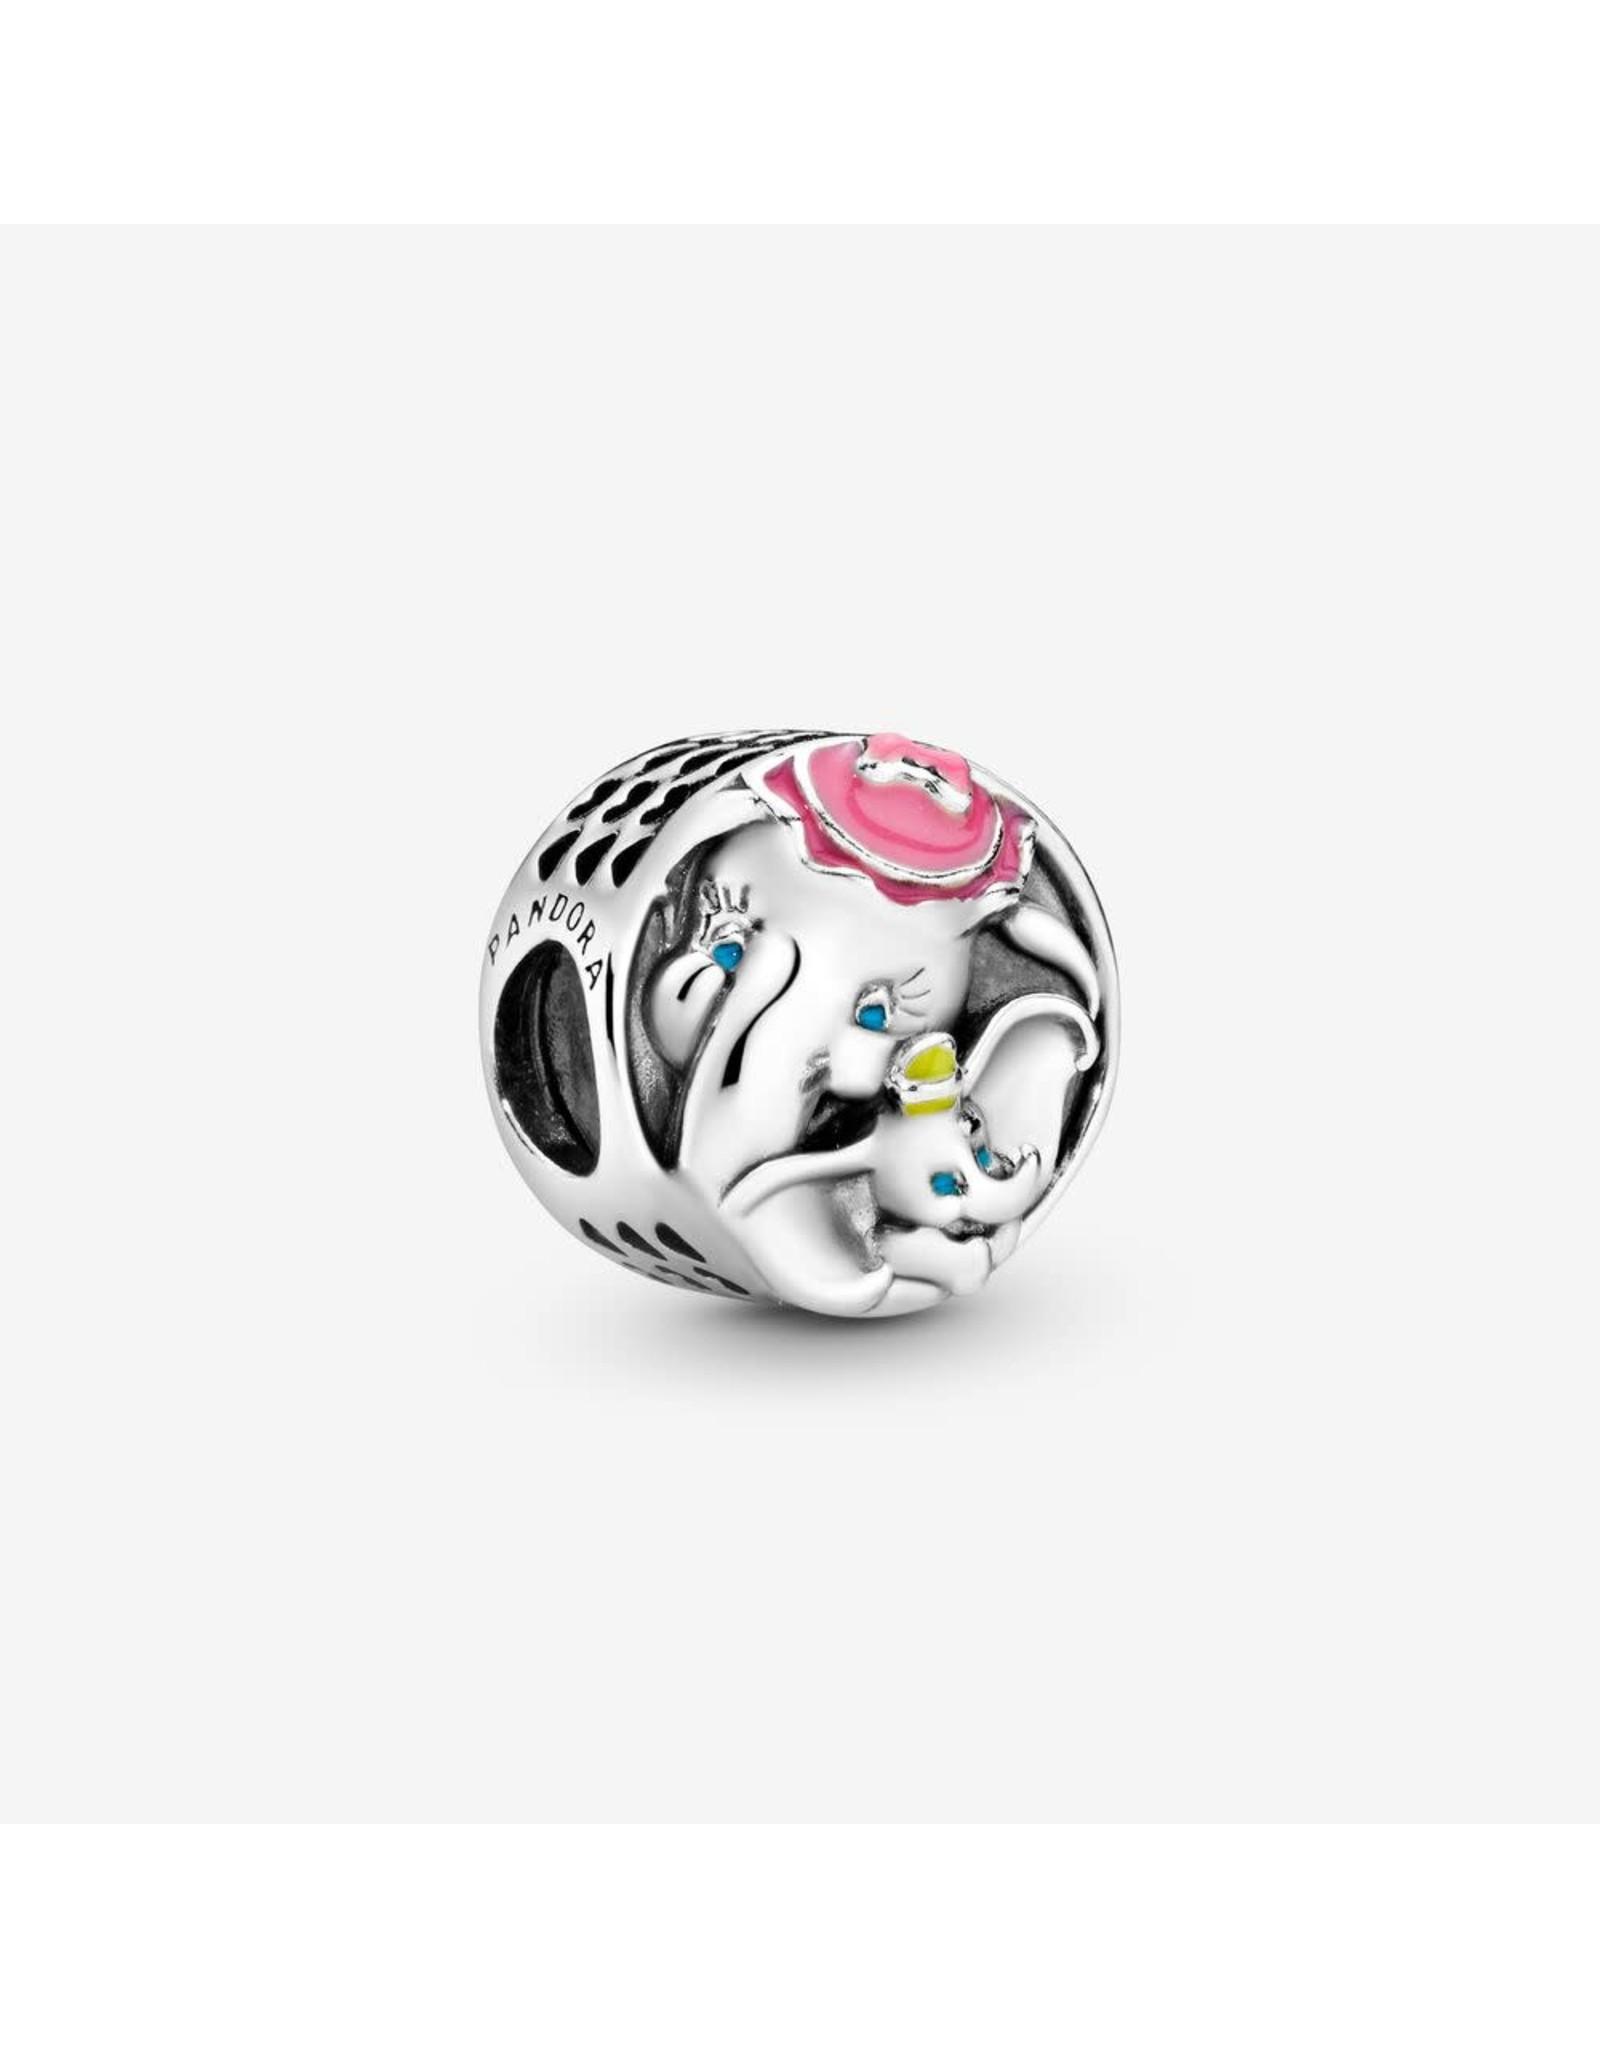 Pandora Pandora Charm, Disney, Dumbo & Mrs. Jumbo, Pink, Blue & Yellow Enamel